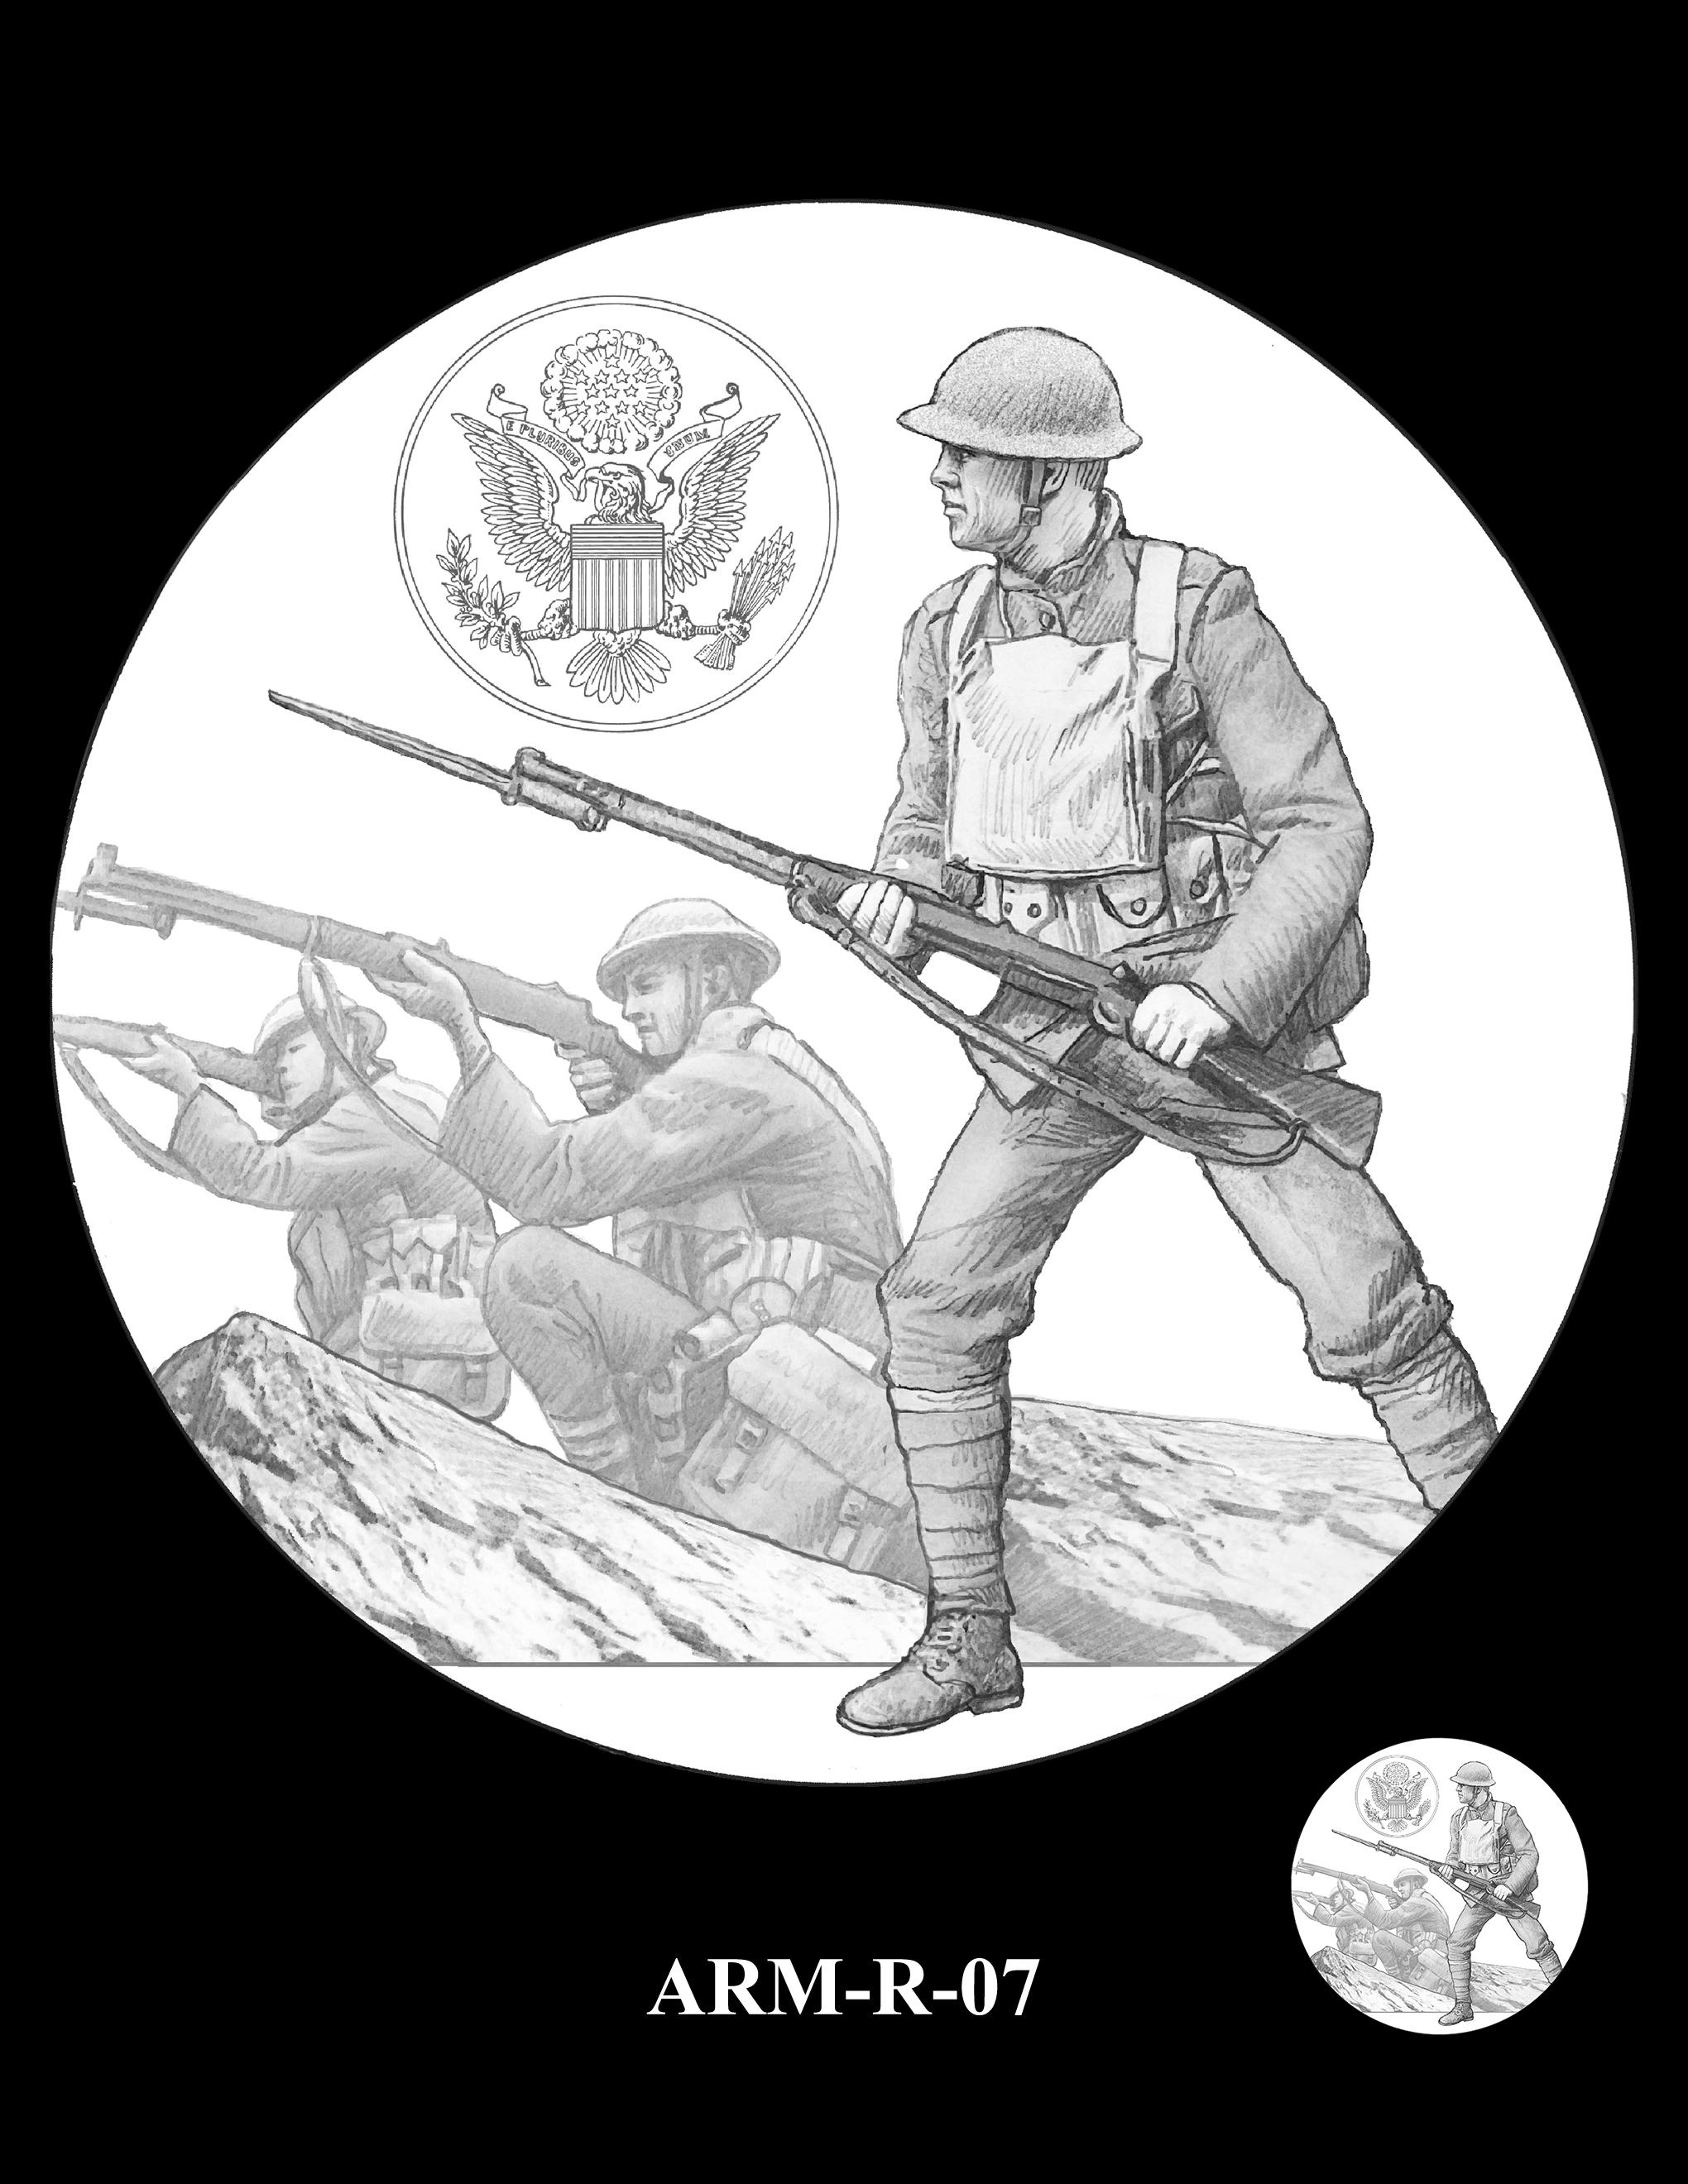 P1-ARM-R-07 -- 2018-World War I Silver Medals - Army